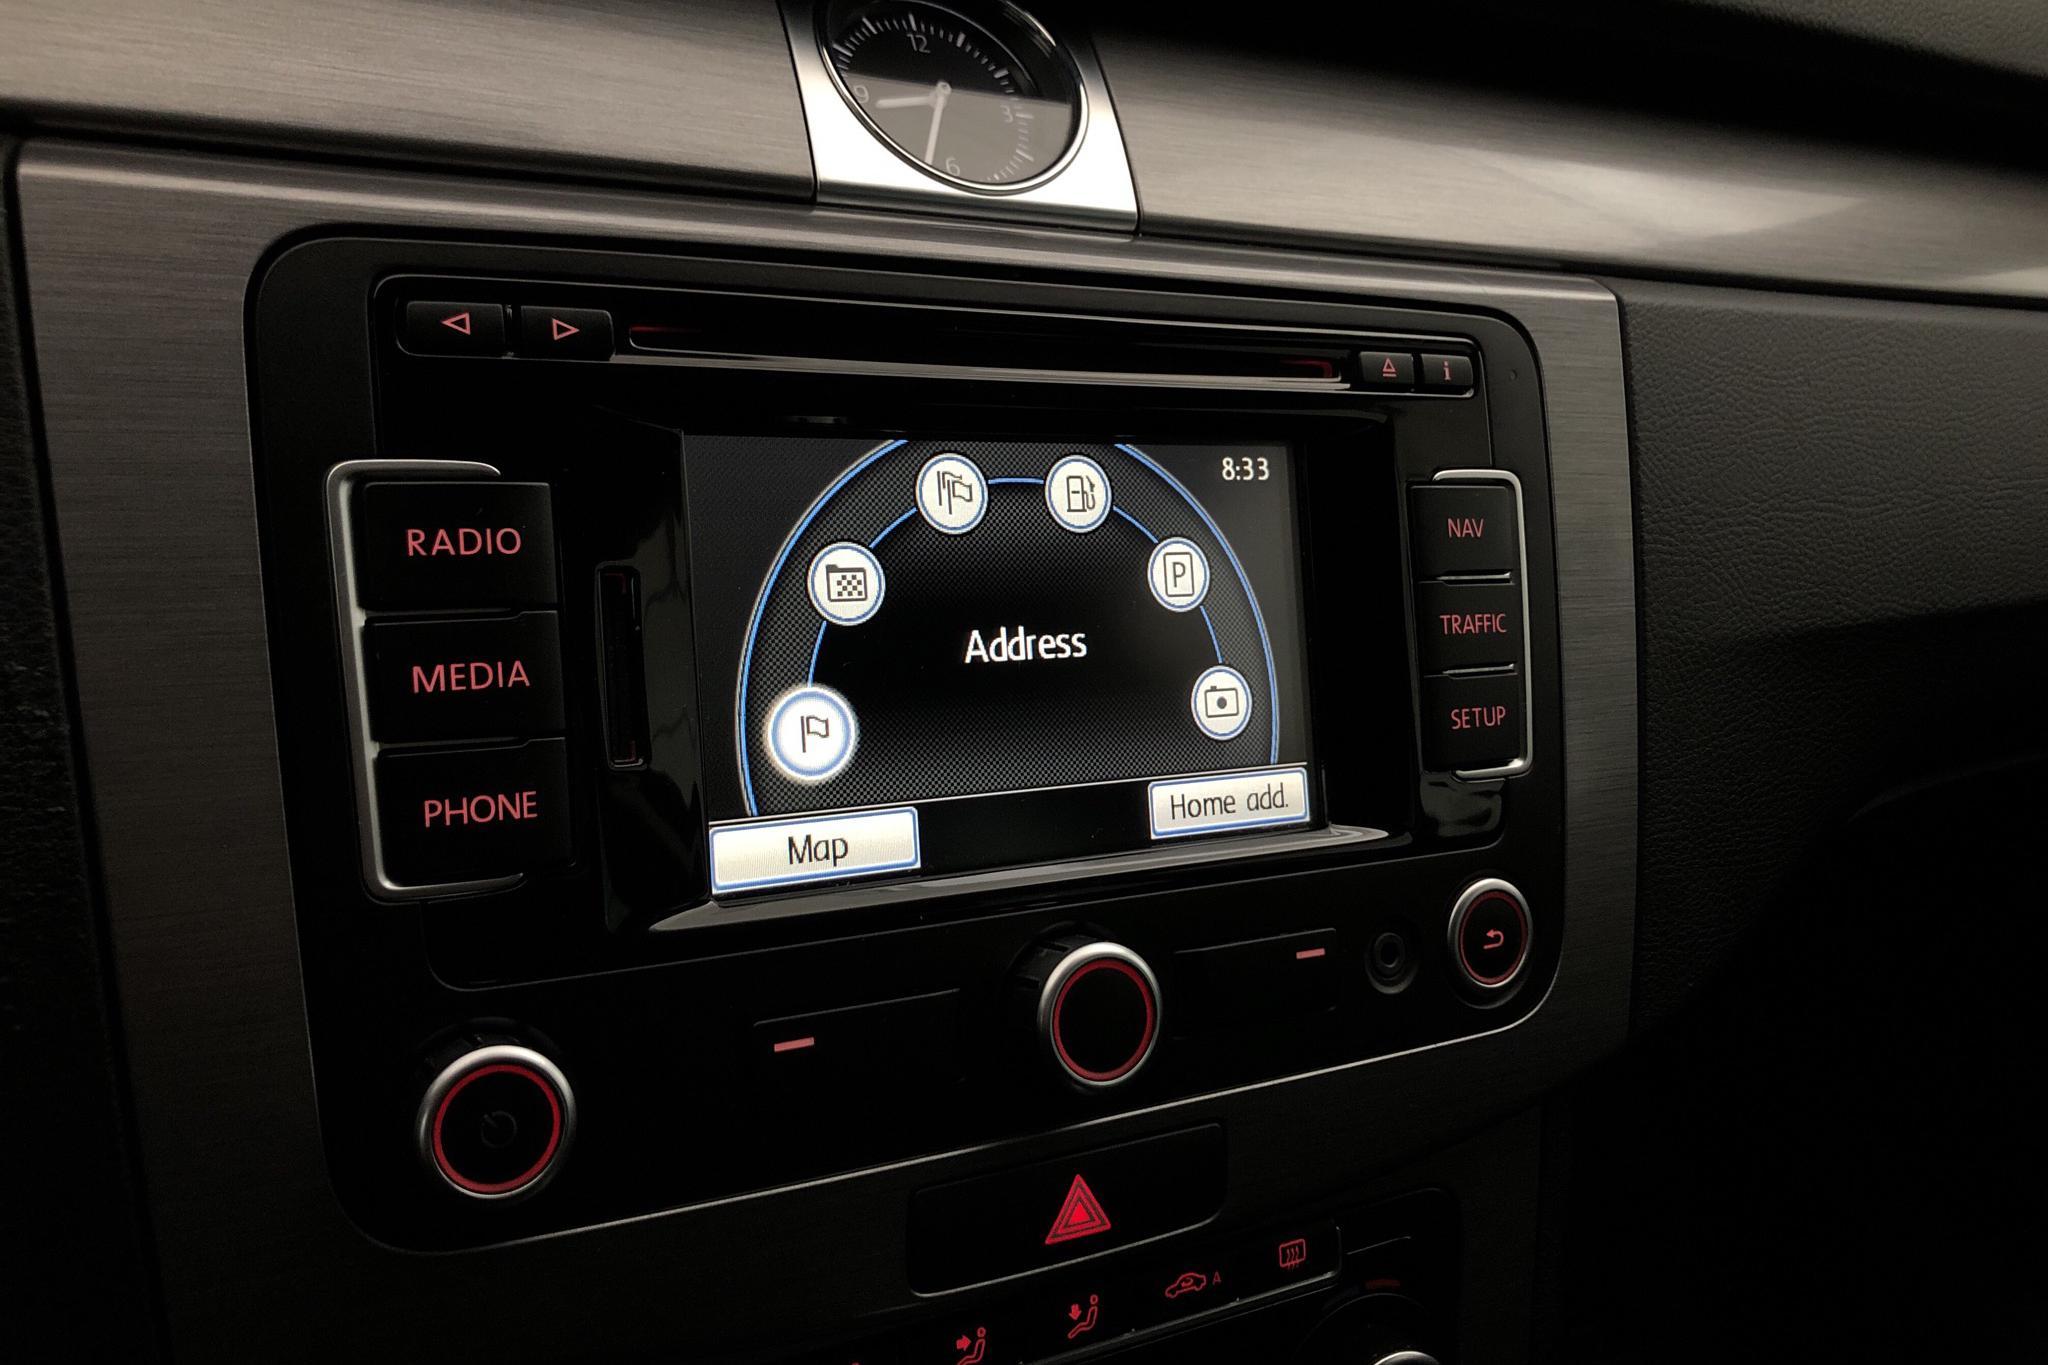 VW Passat 2.0 TDI BlueMotion Technology Variant 4Motion (170hk) - 23 041 mil - Automat - röd - 2011